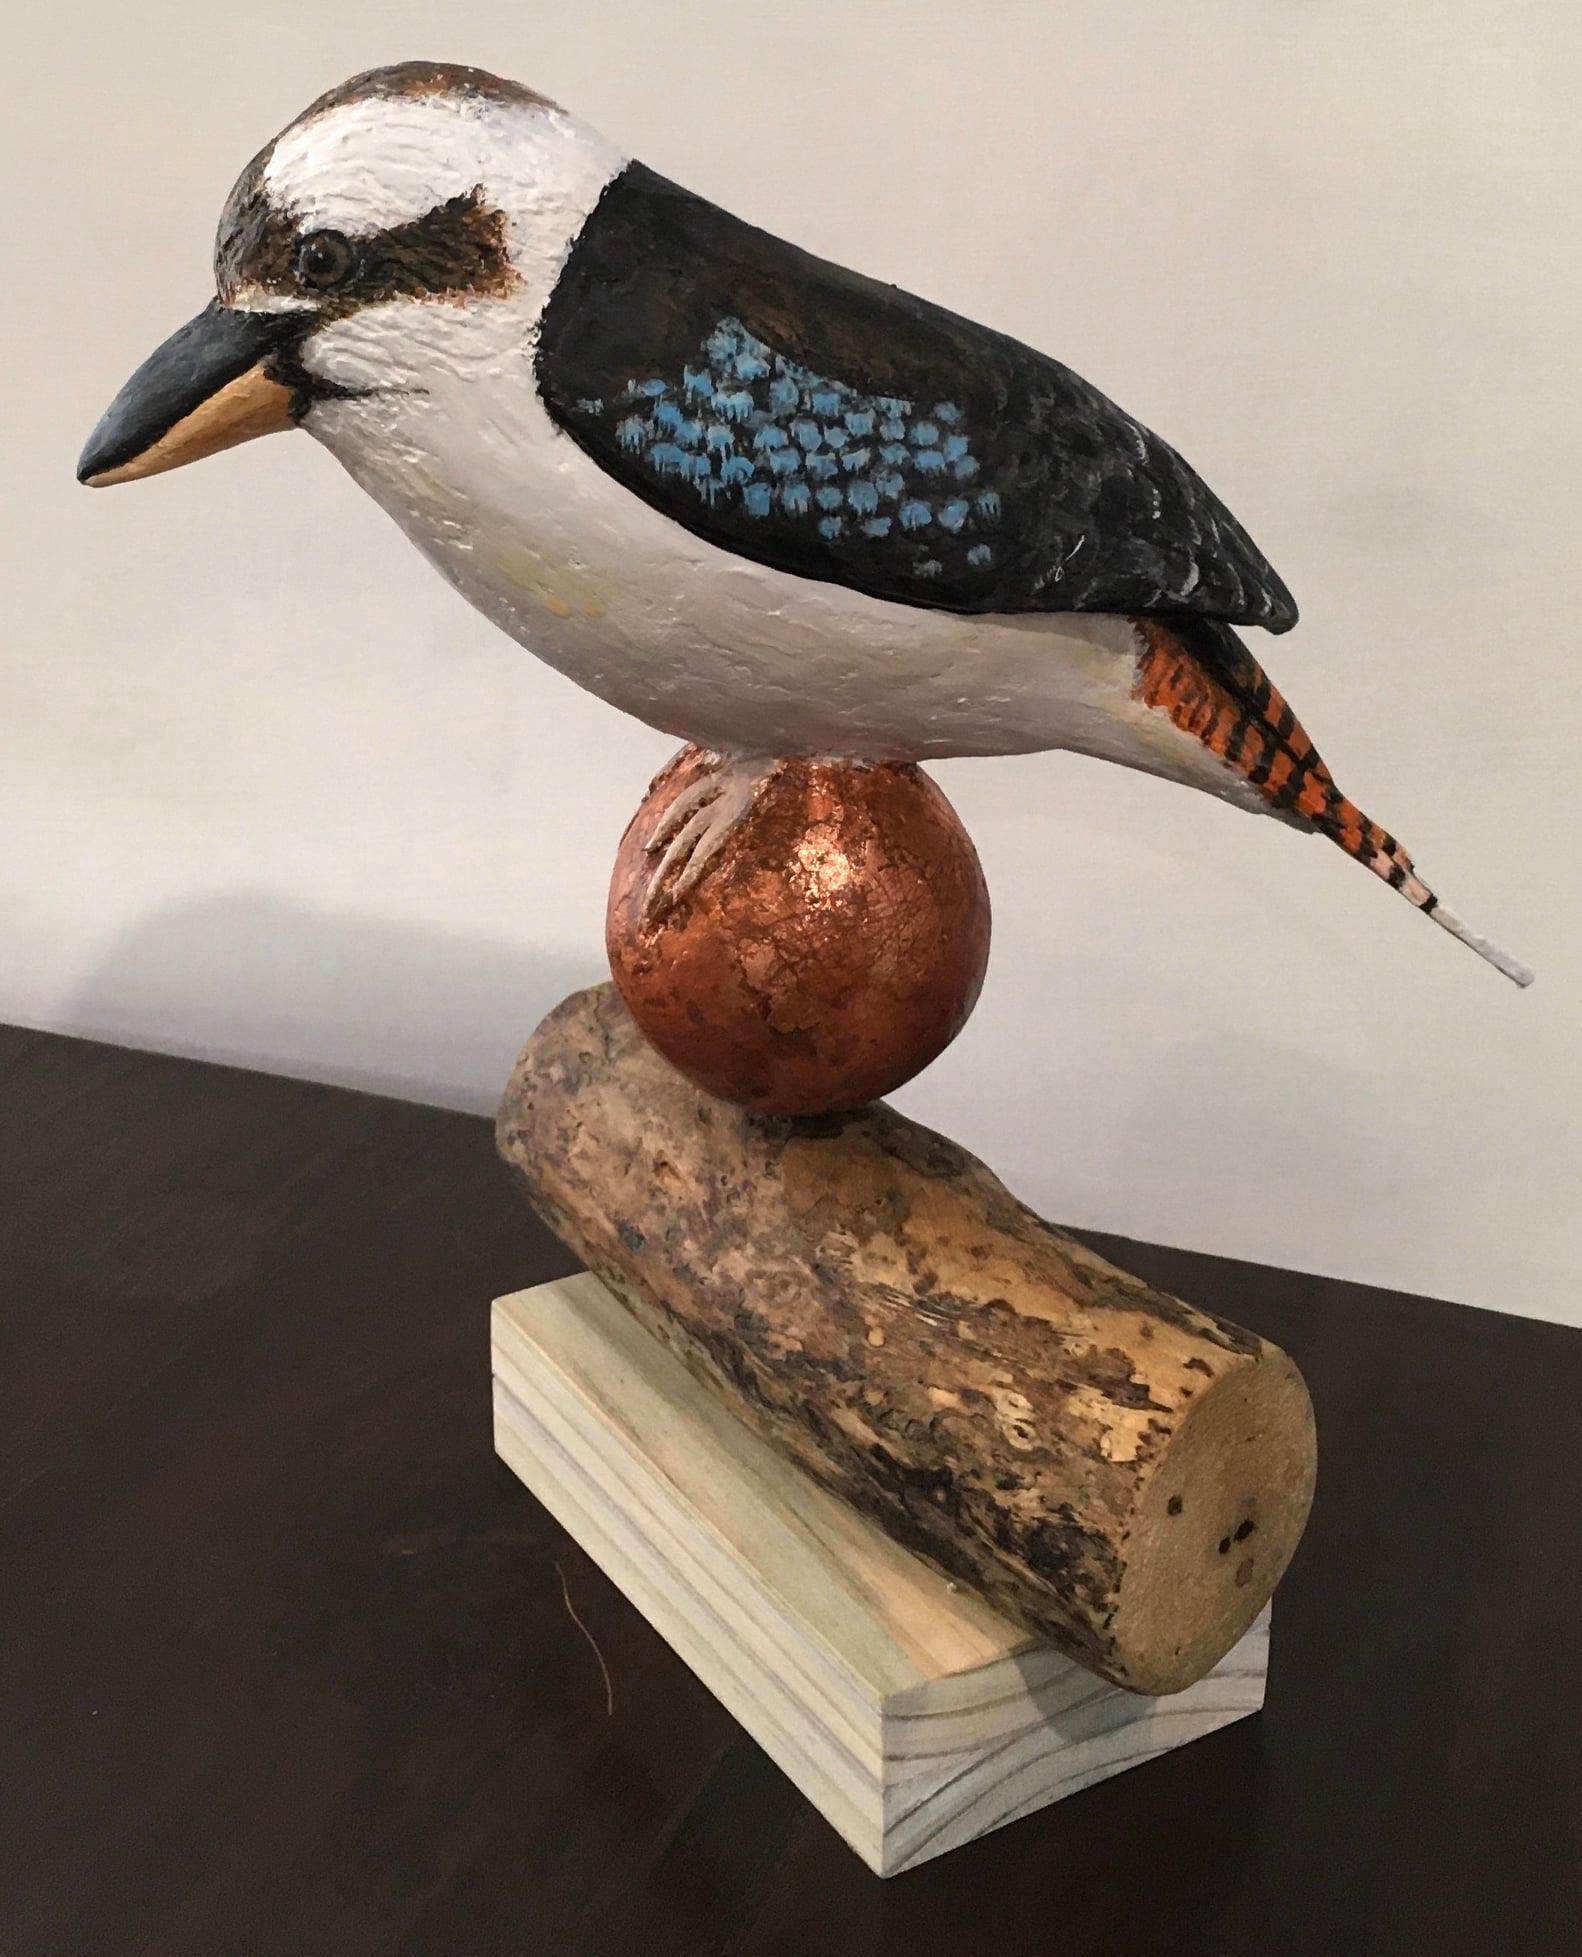 Kookaburra sculpture by May Sheppard